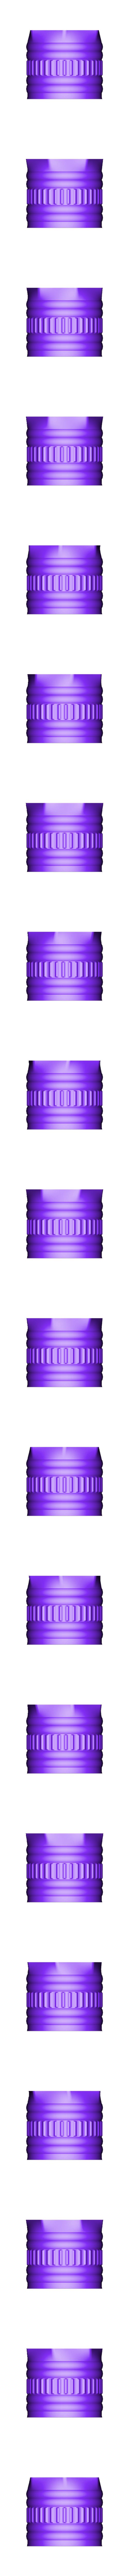 Douille.STL Download free STL file Big pen box • 3D print template, Lyryln